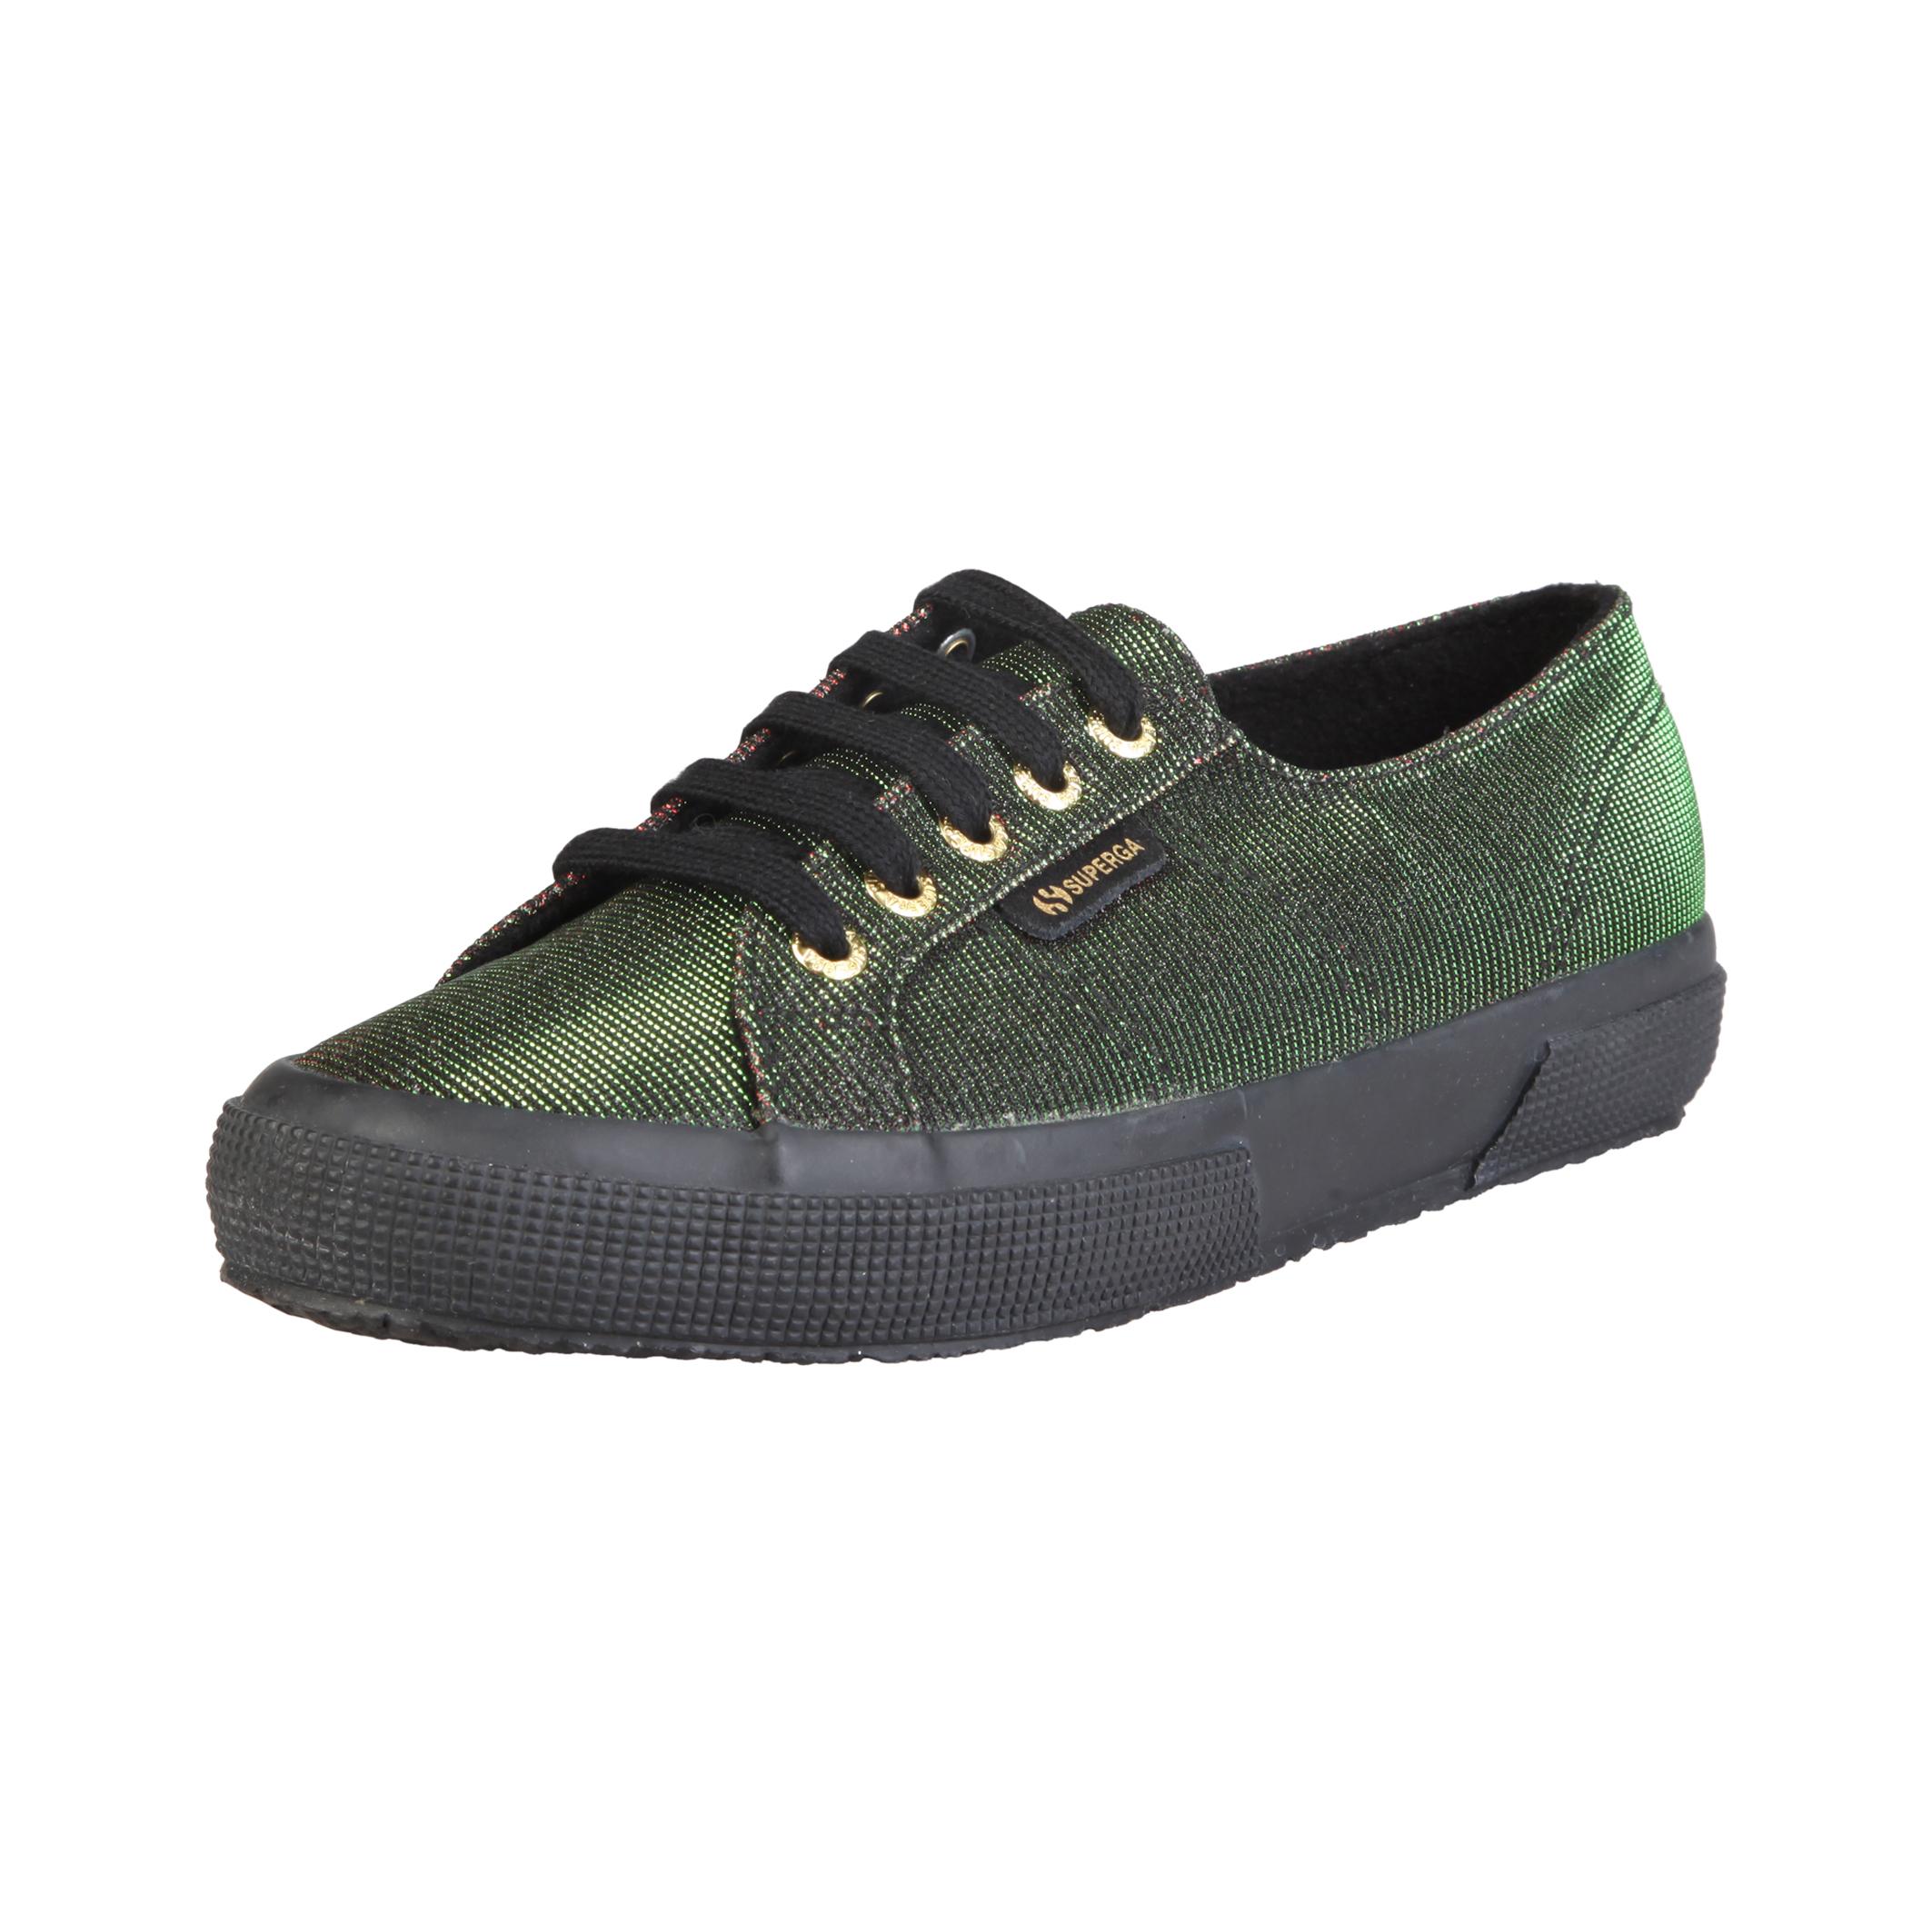 Chaussures  Superga S009Y40_2750 black